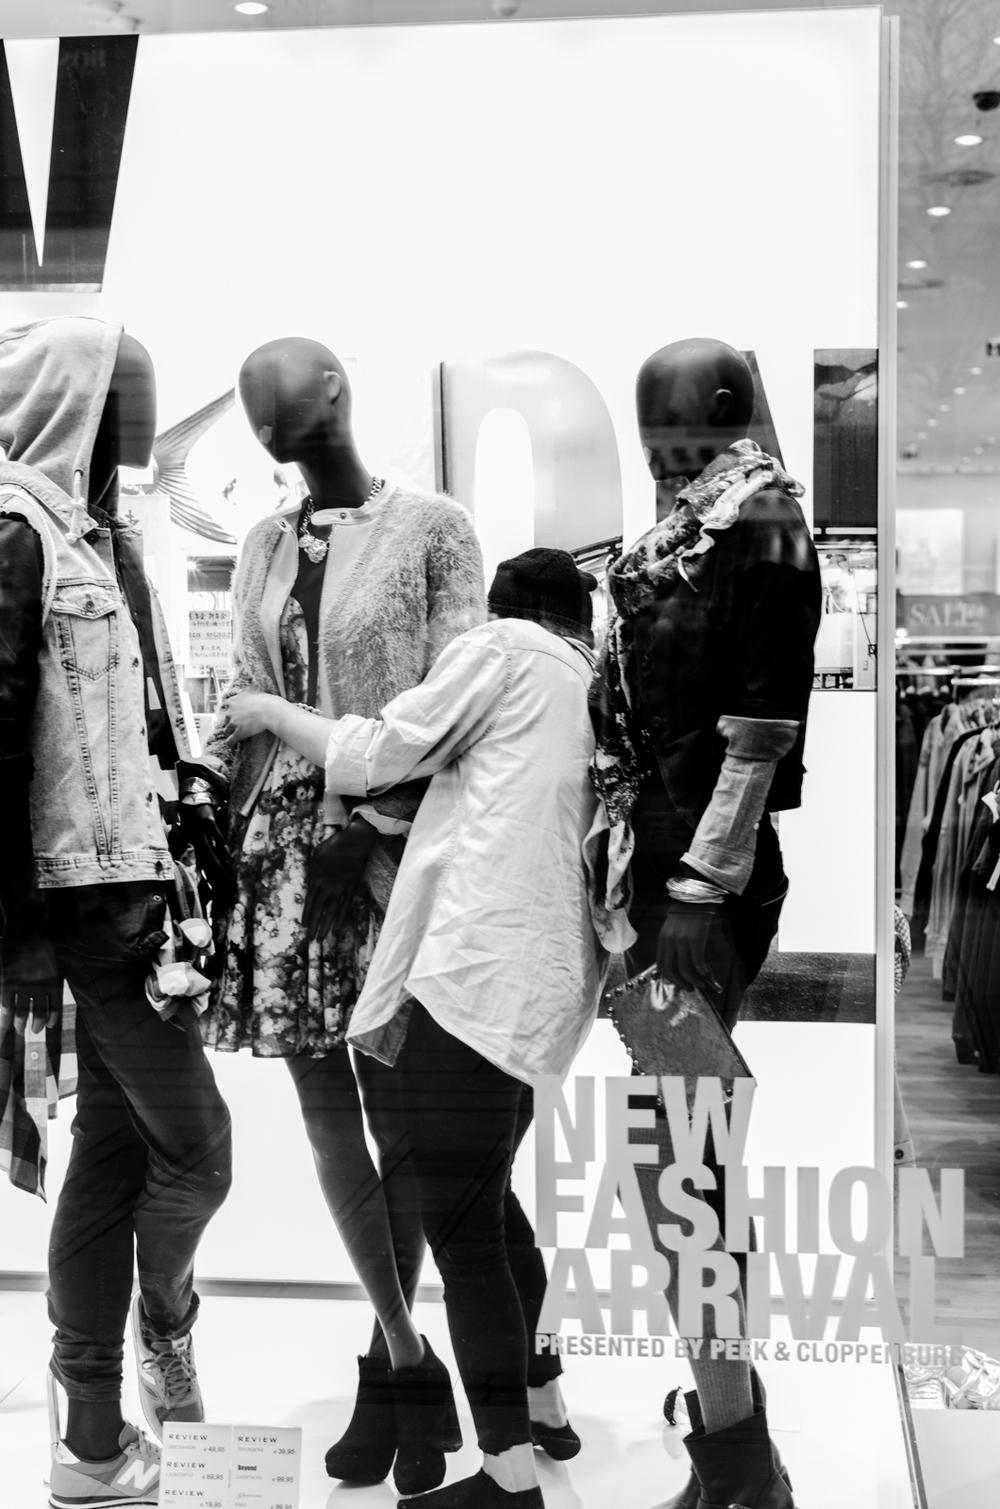 Project 365: #32 - Fashion